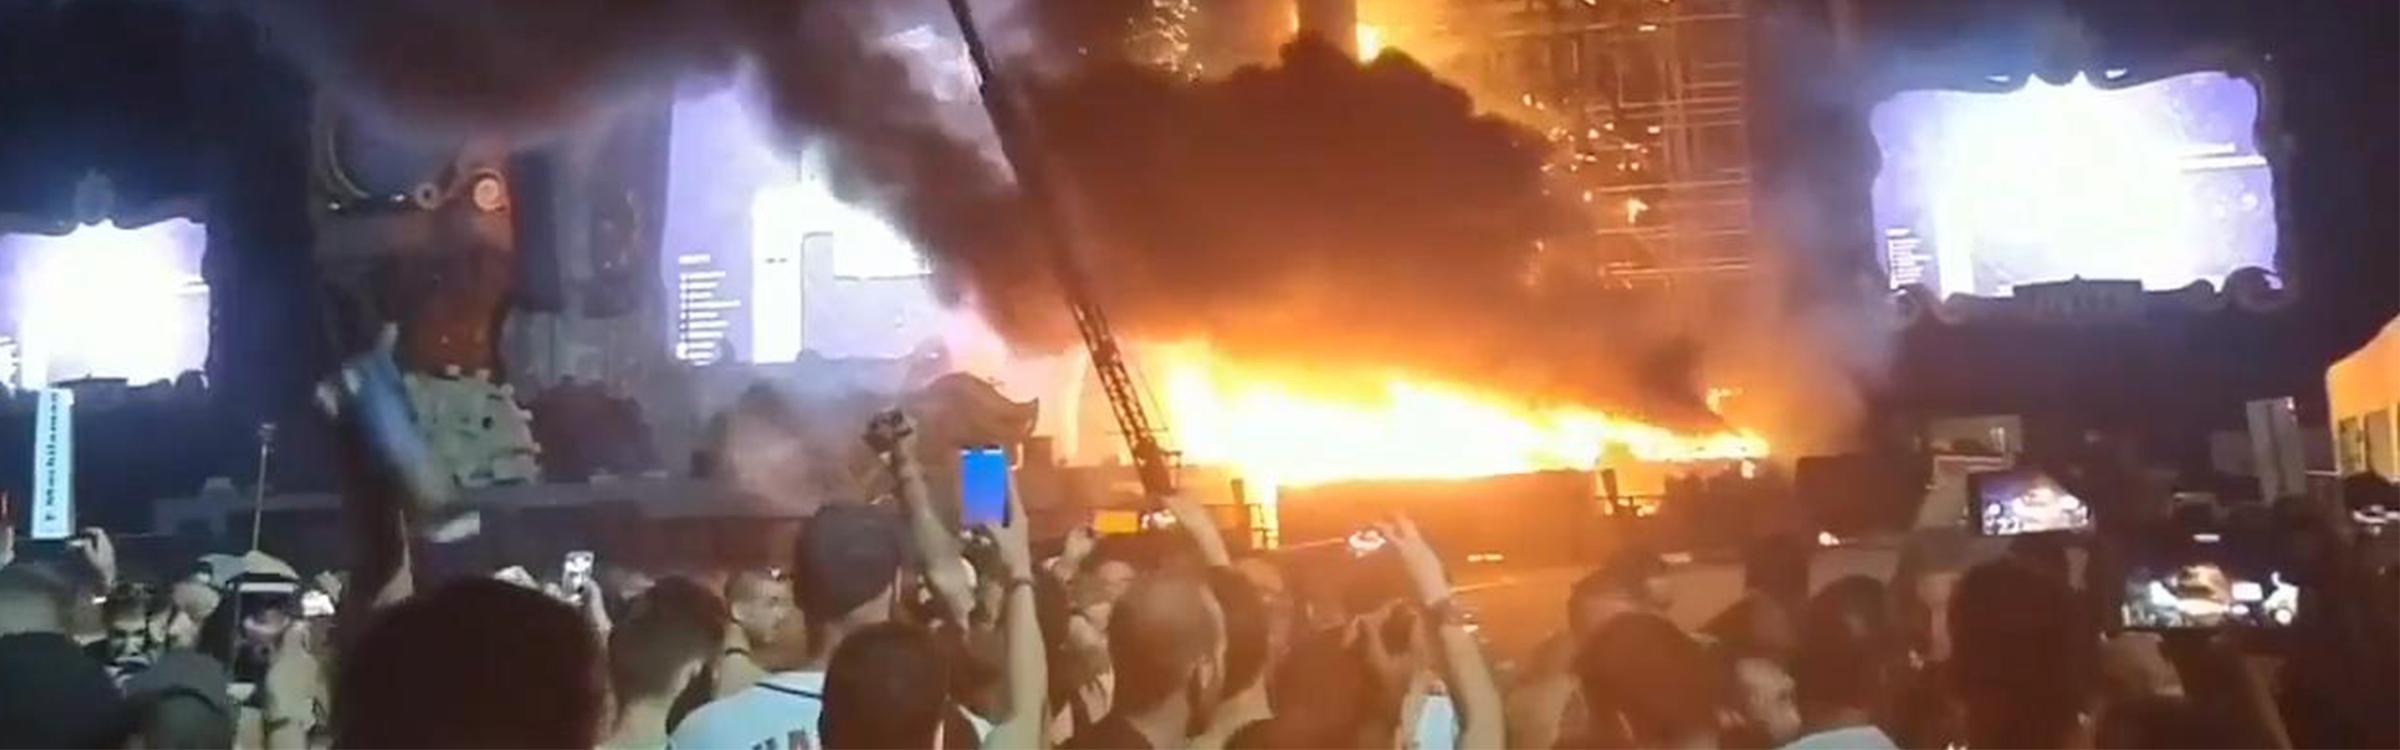 Fire unite header